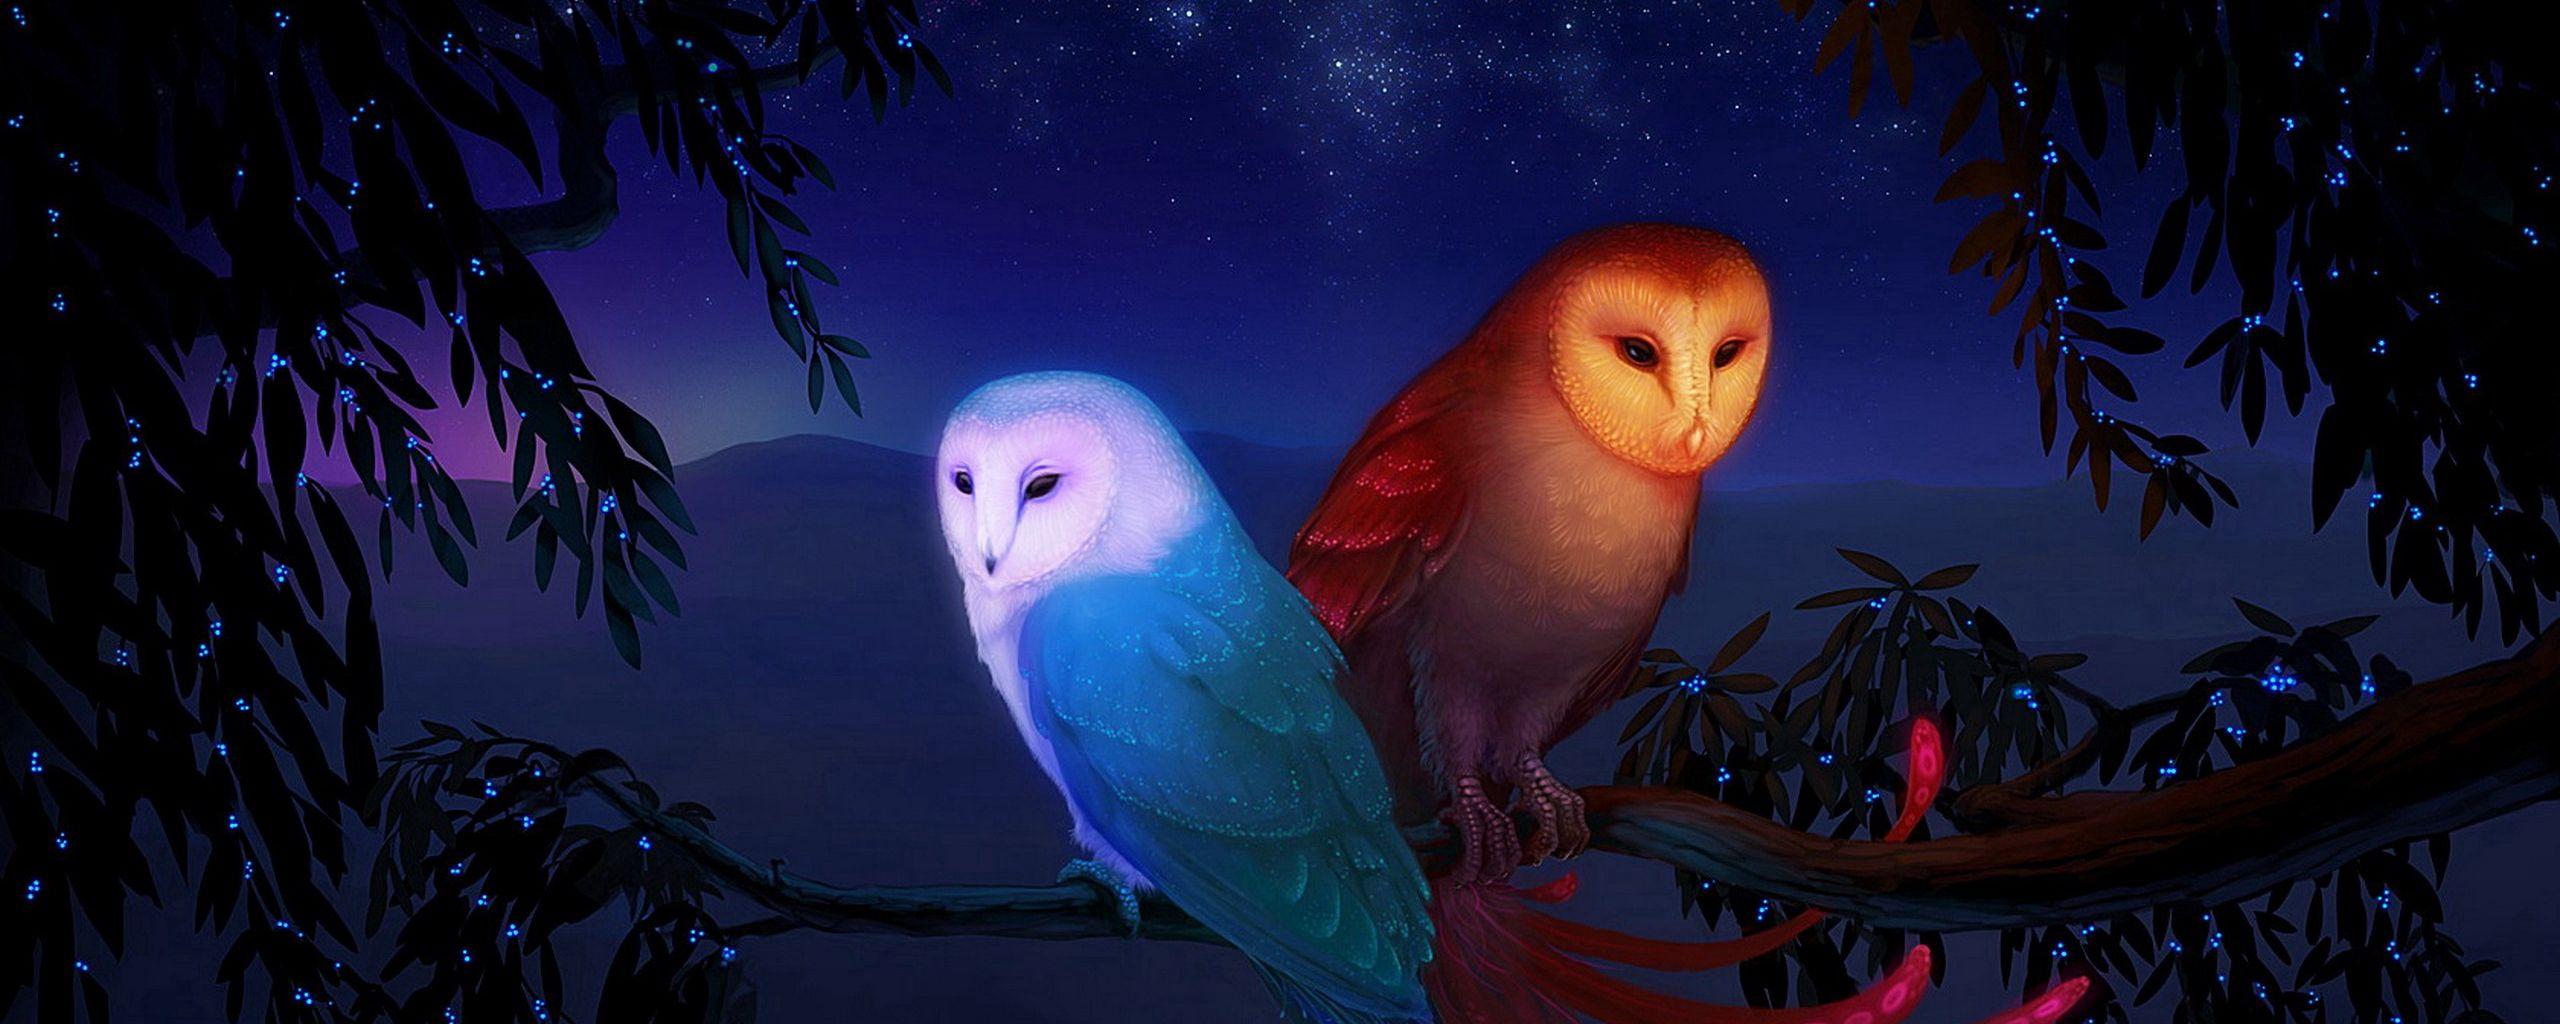 2560x1024 Wallpaper owl, night, birds, branch